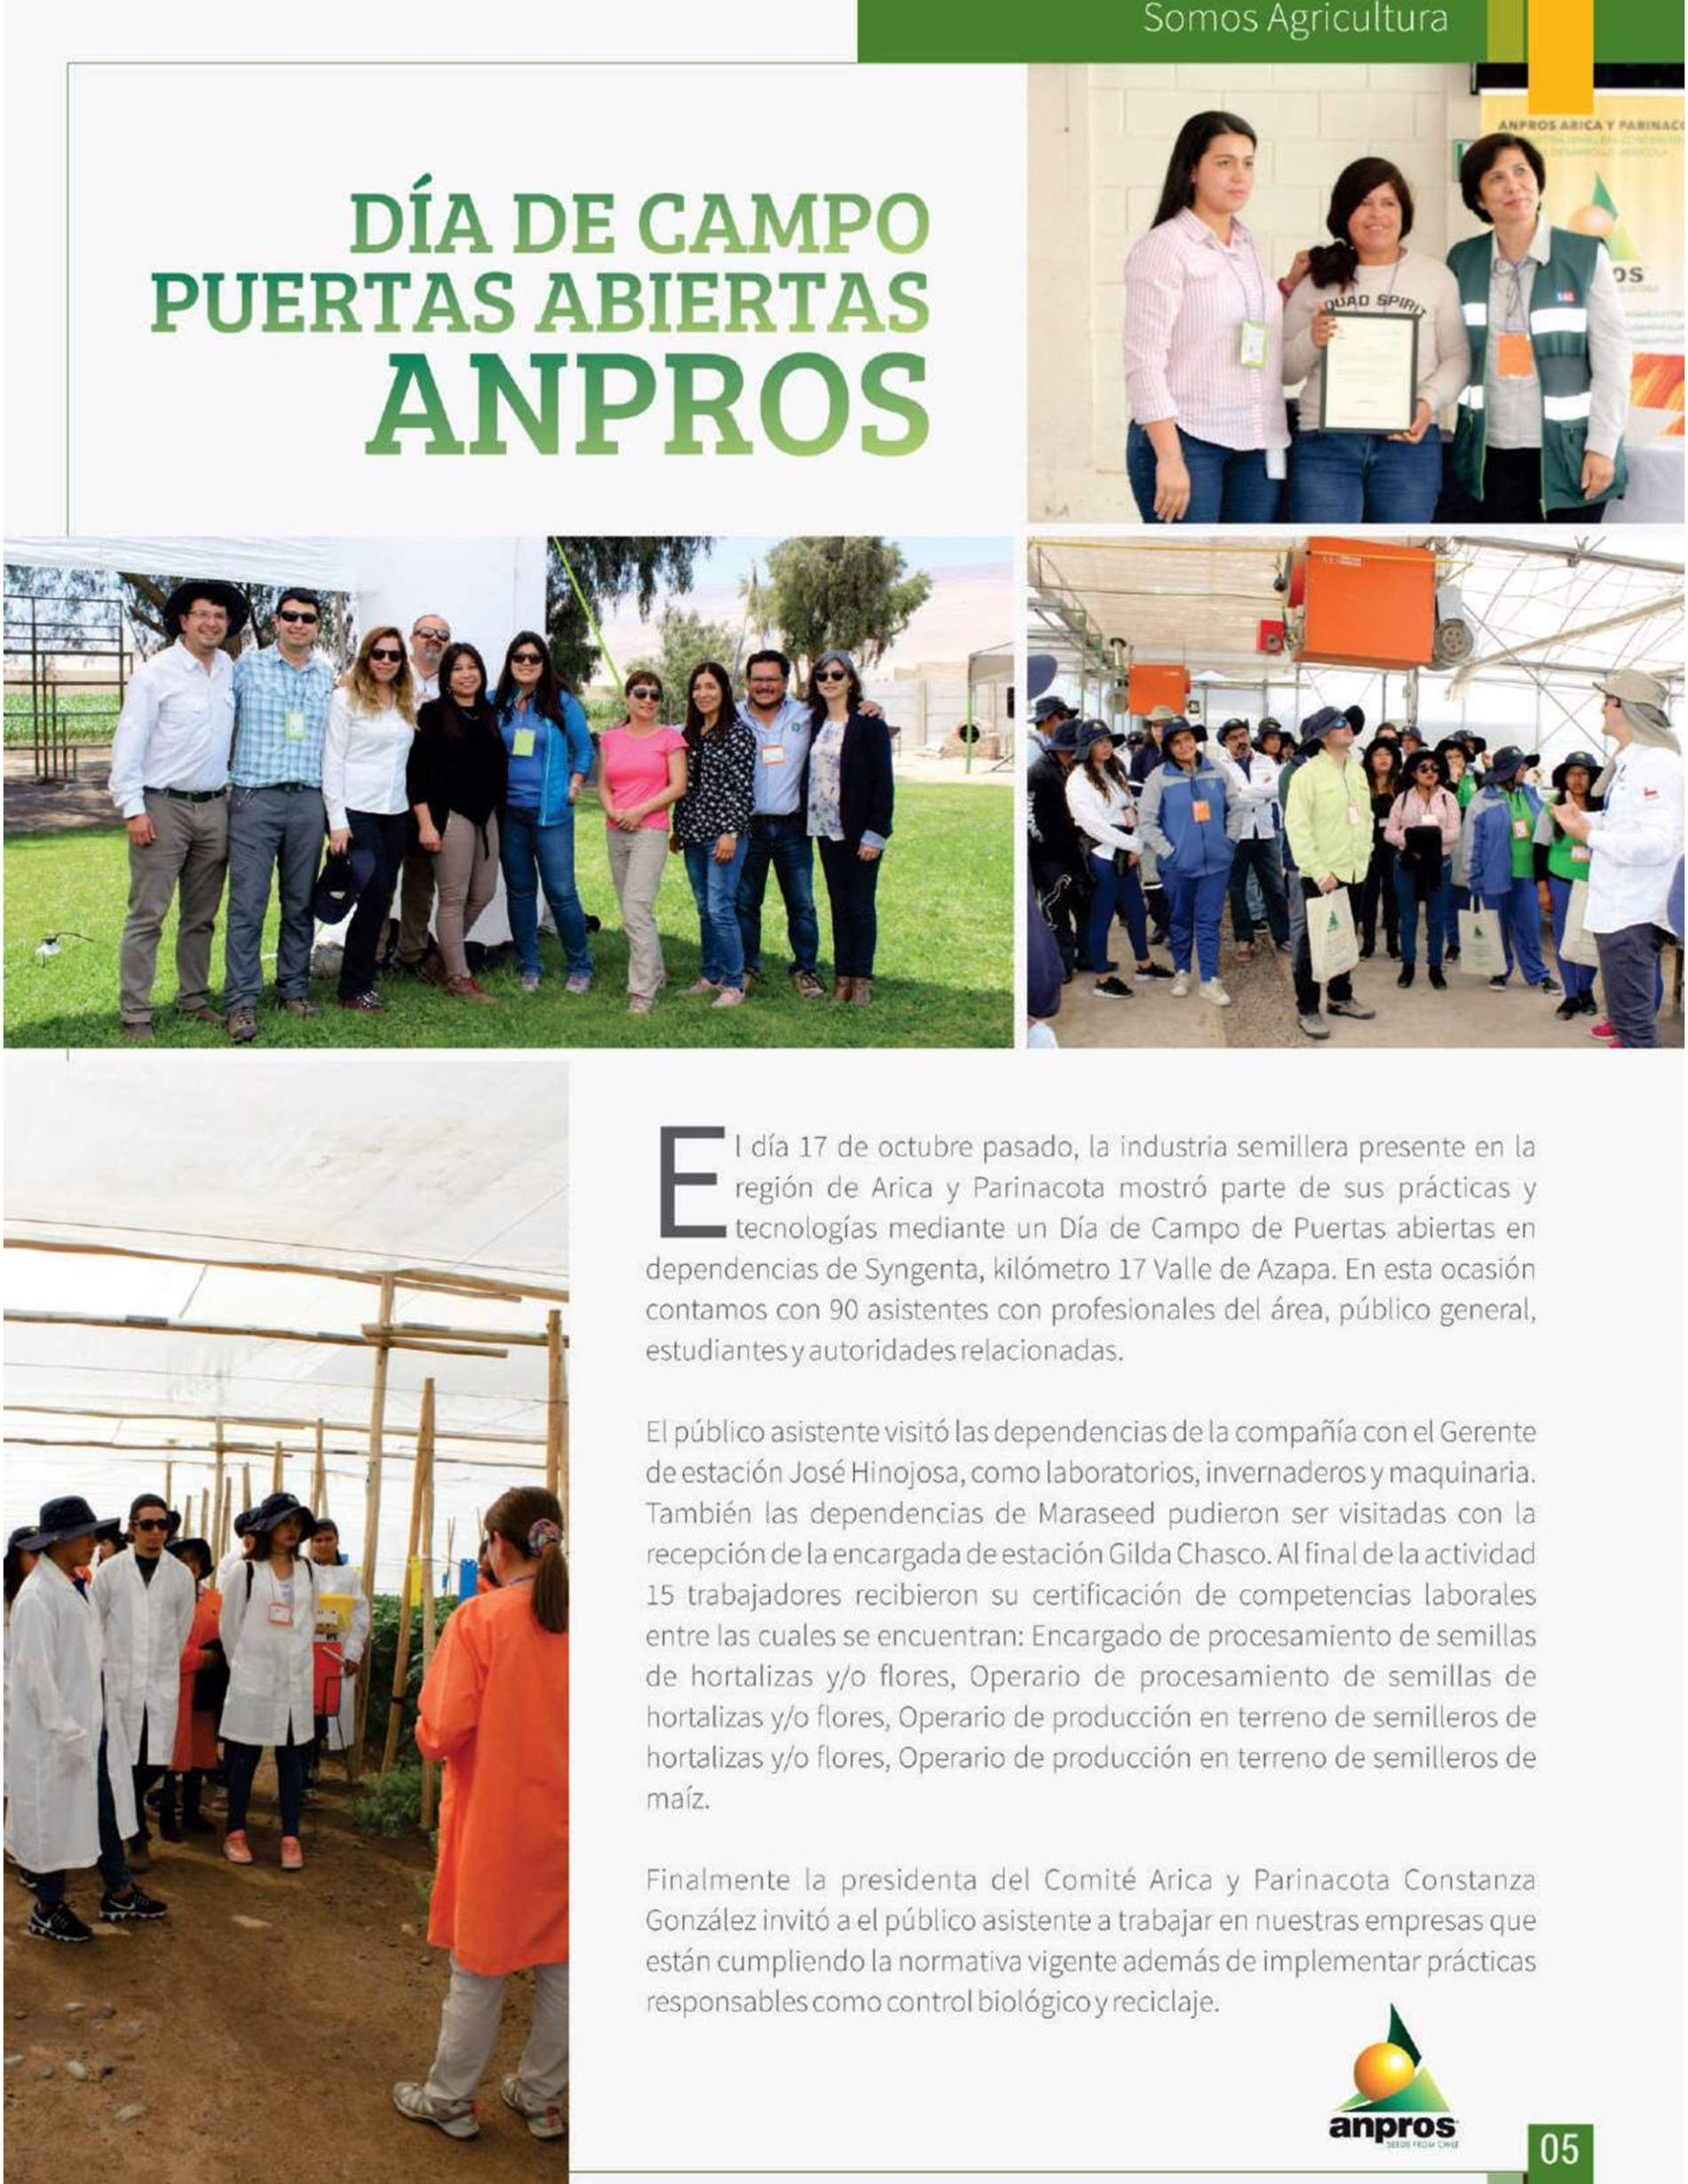 Revista Somos Agricultura destaca realización deDía de campo en Arica